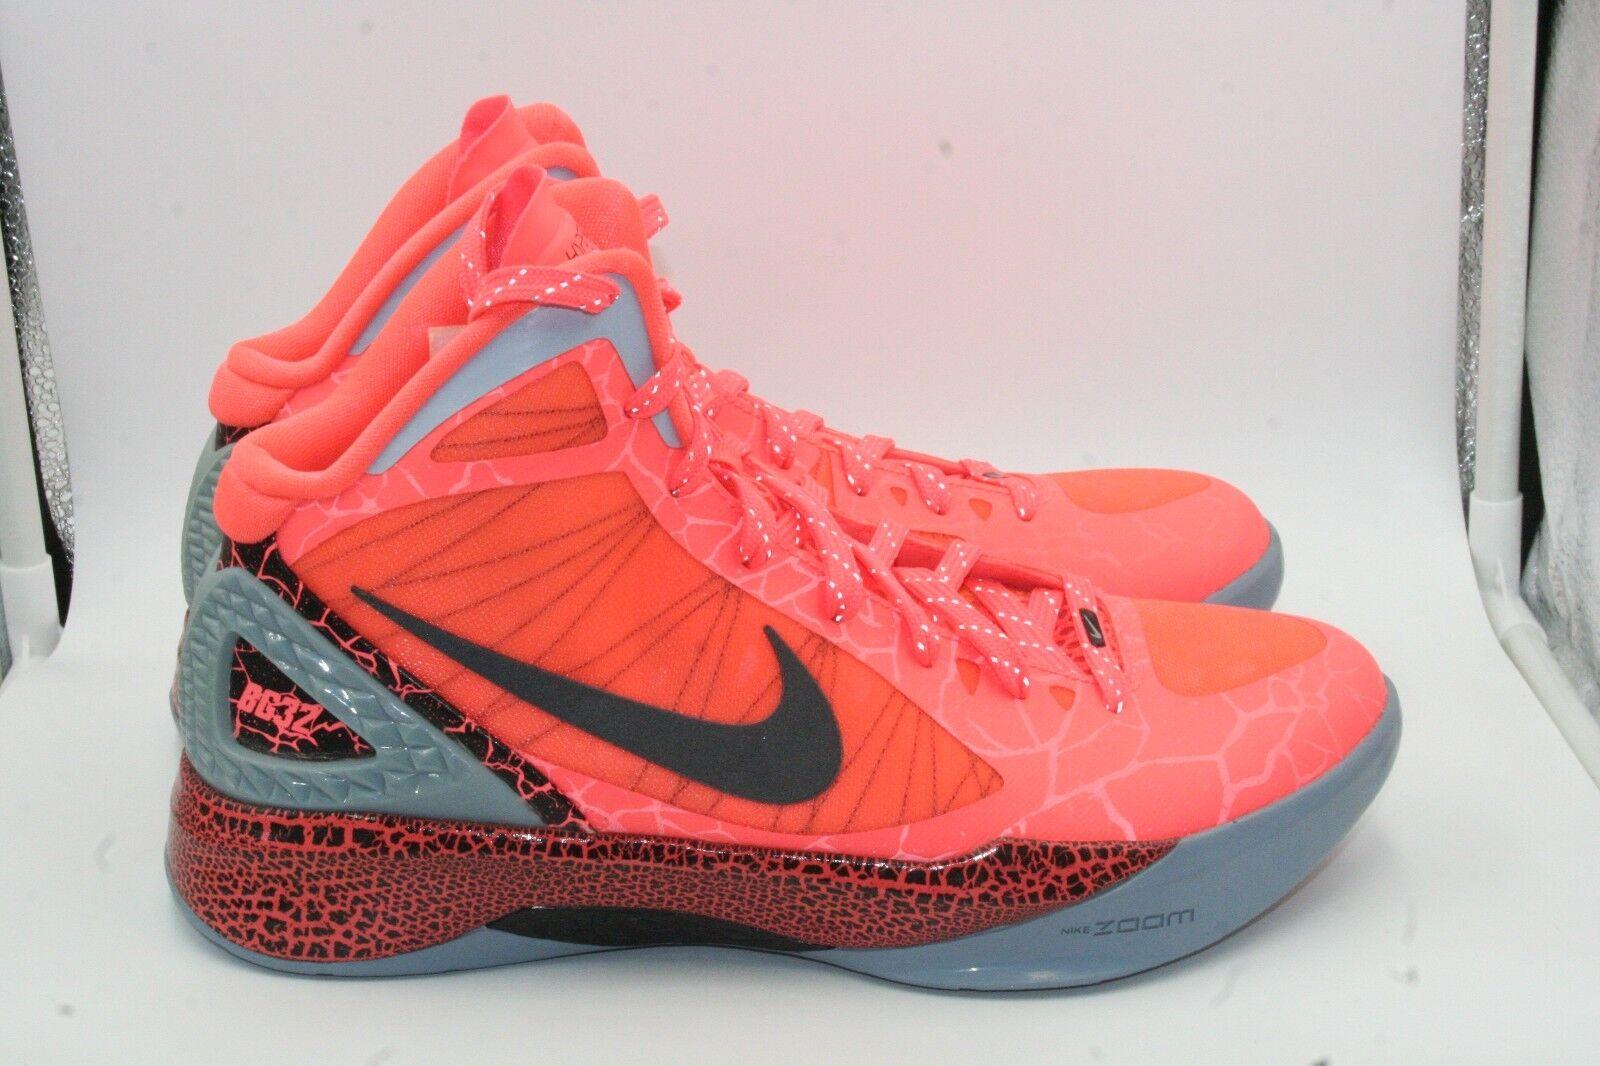 Nike Hyperdunk 2011 SZ DS 11.5 Blake Griffin 2011 All Star Game Slam Dunk Mango